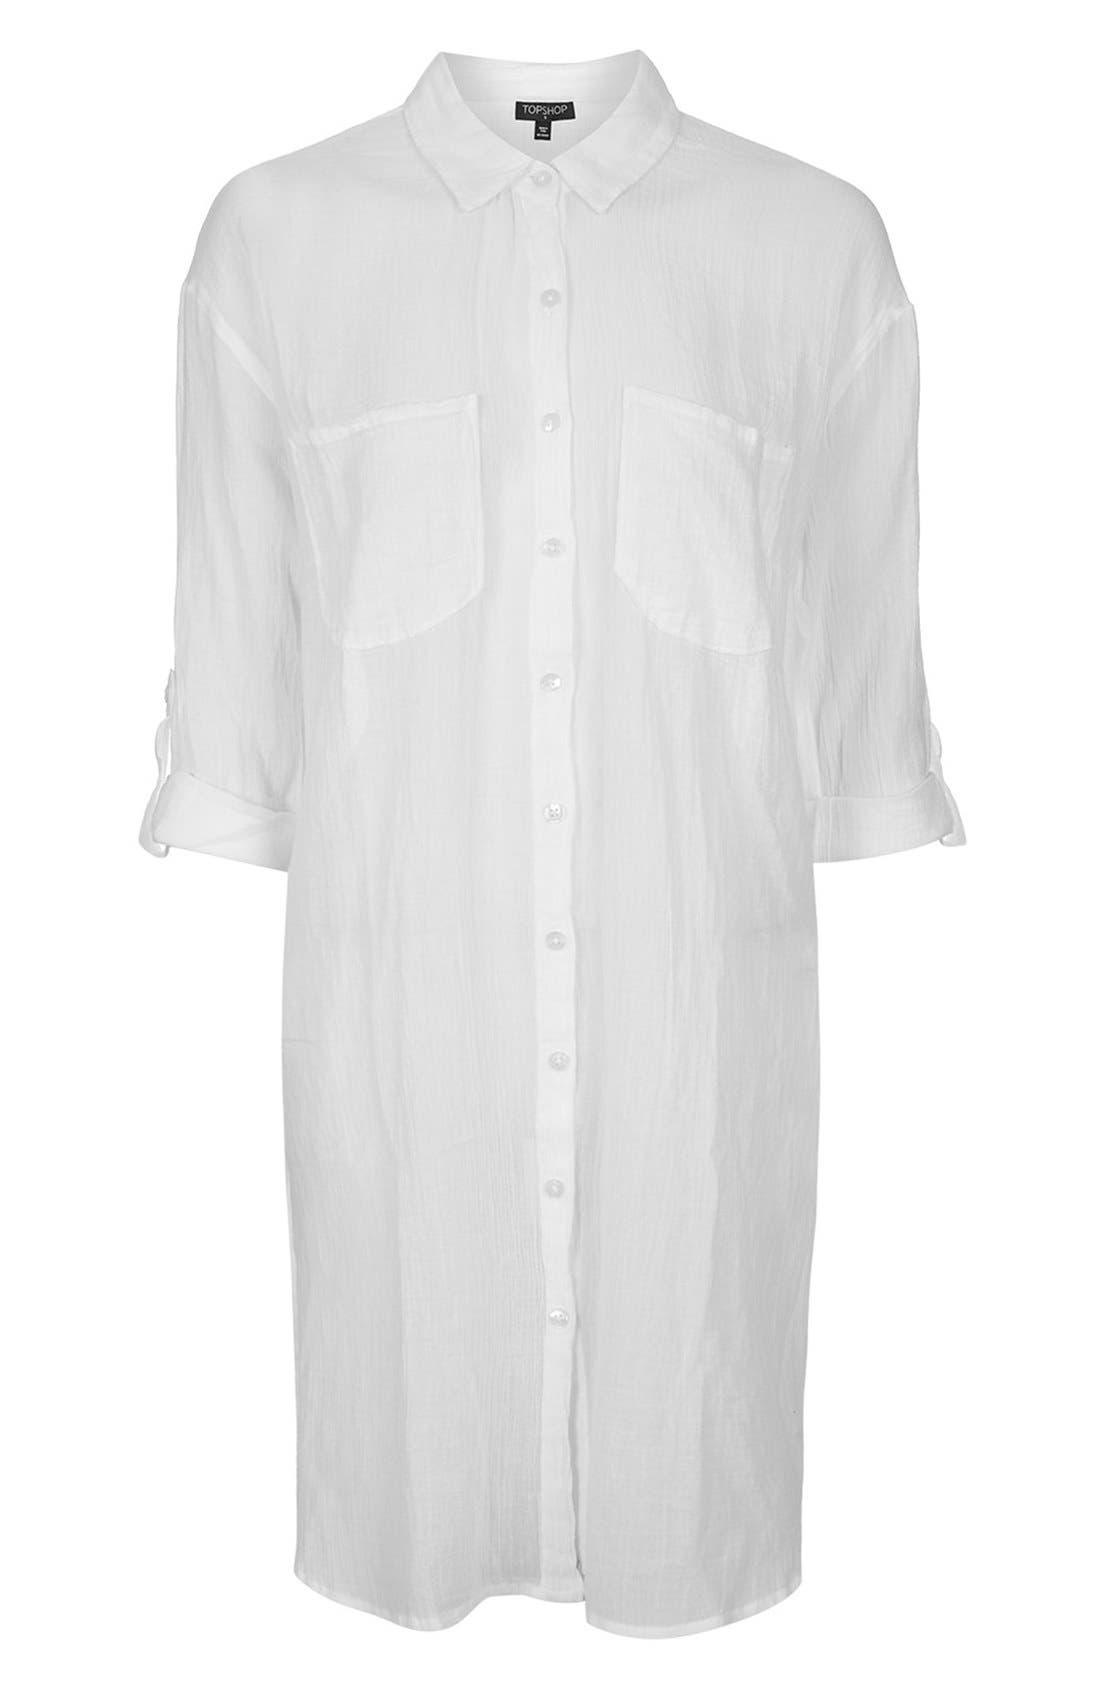 Main Image - Topshop Lattice Side Cover-Up Shirt